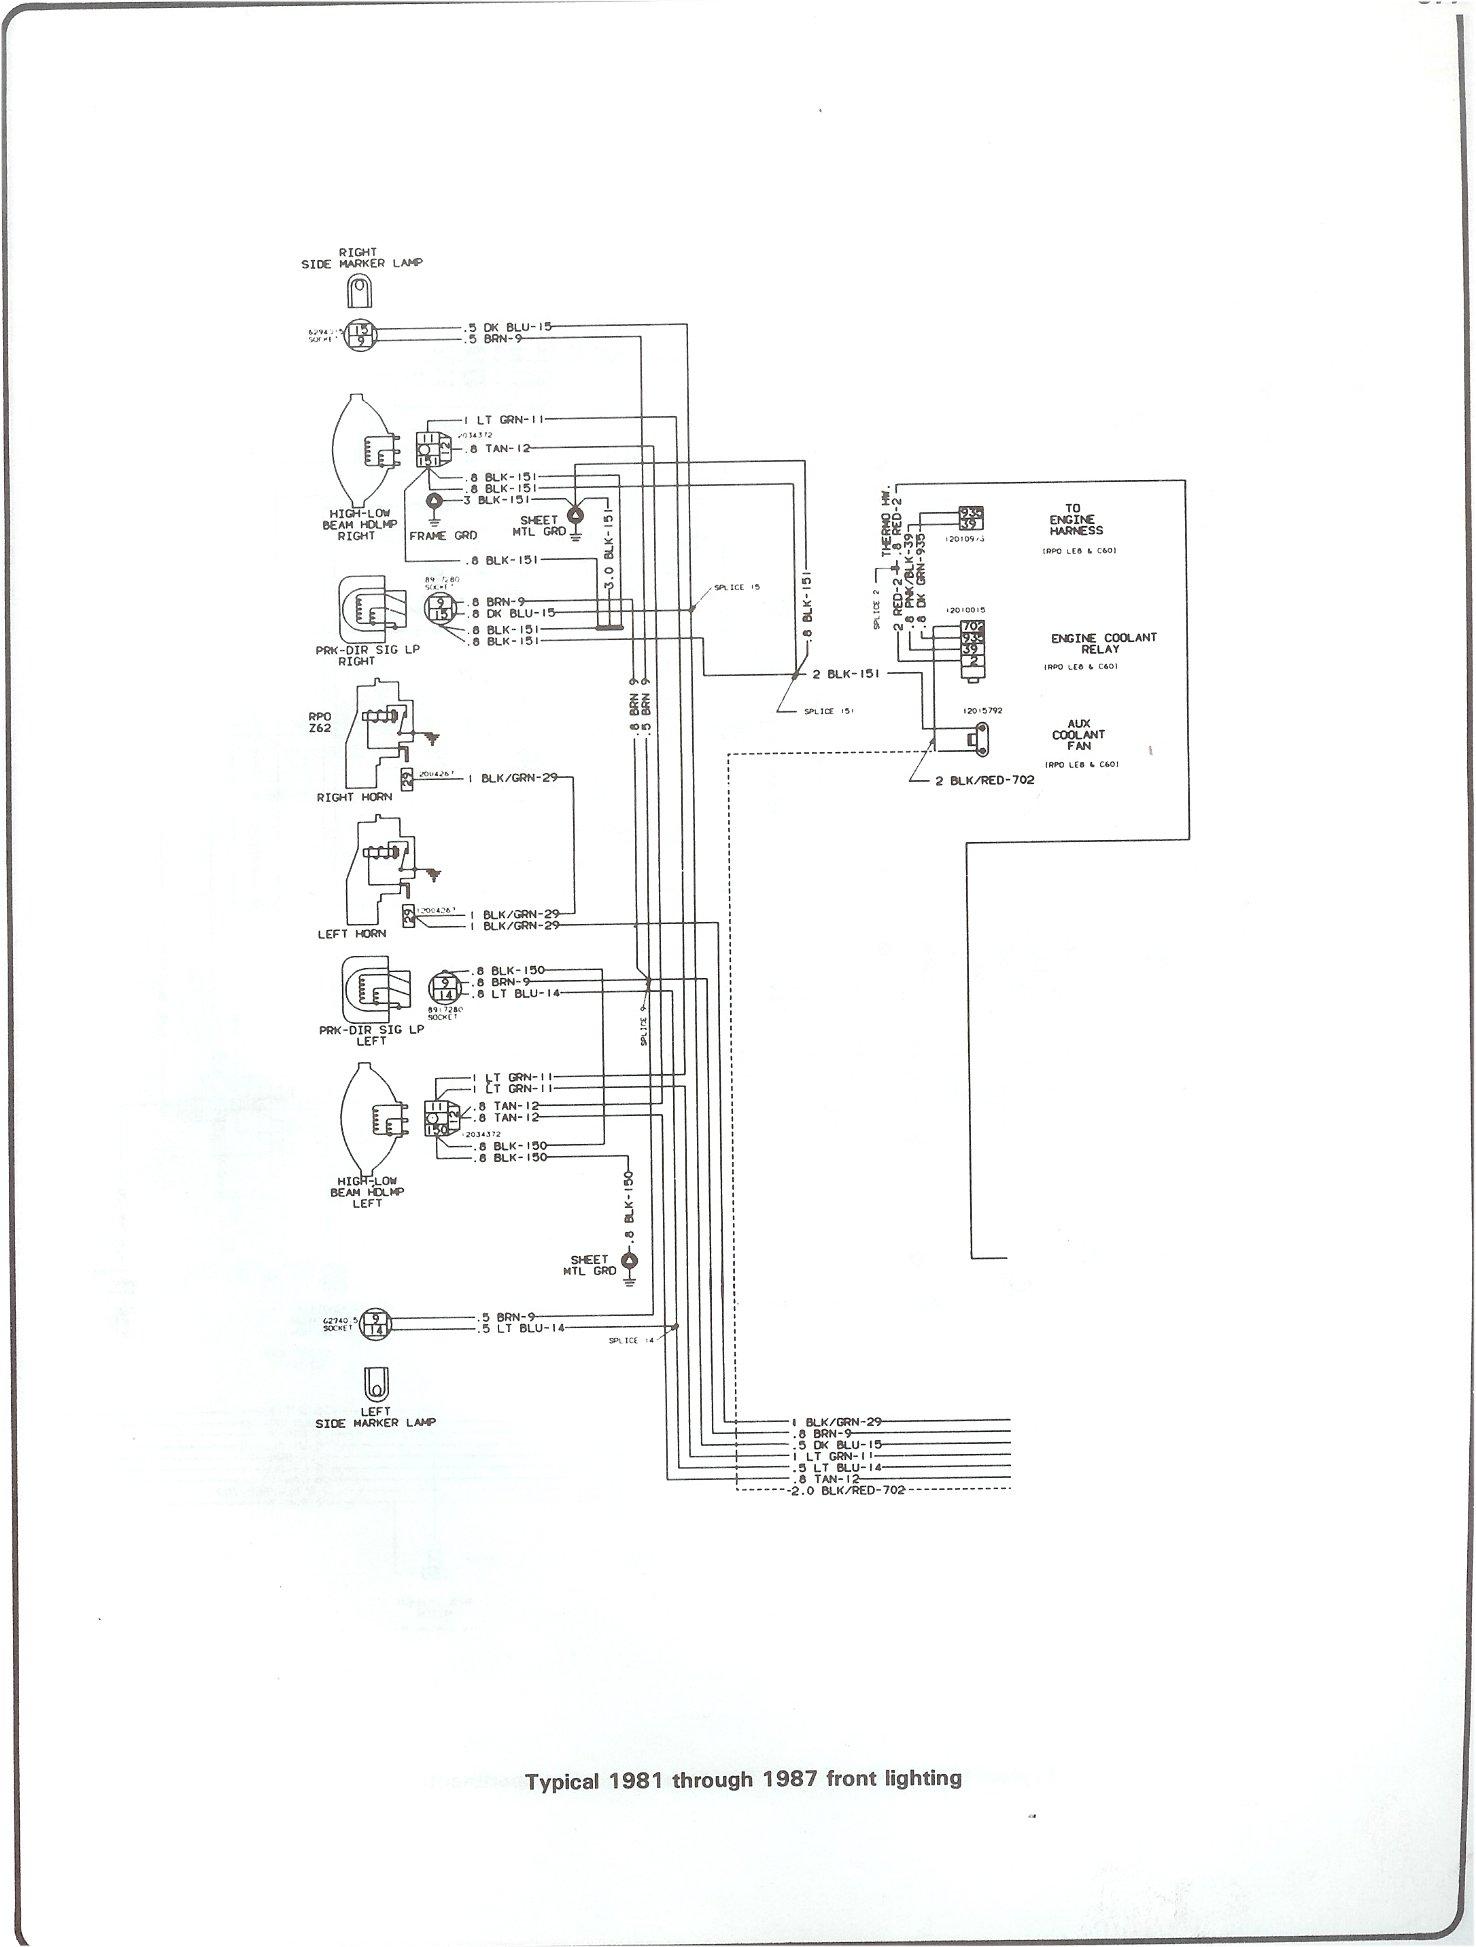 Amazing 1980 Gmc Wiring Wiring Diagram Wiring Cloud Icalpermsplehendilmohammedshrineorg